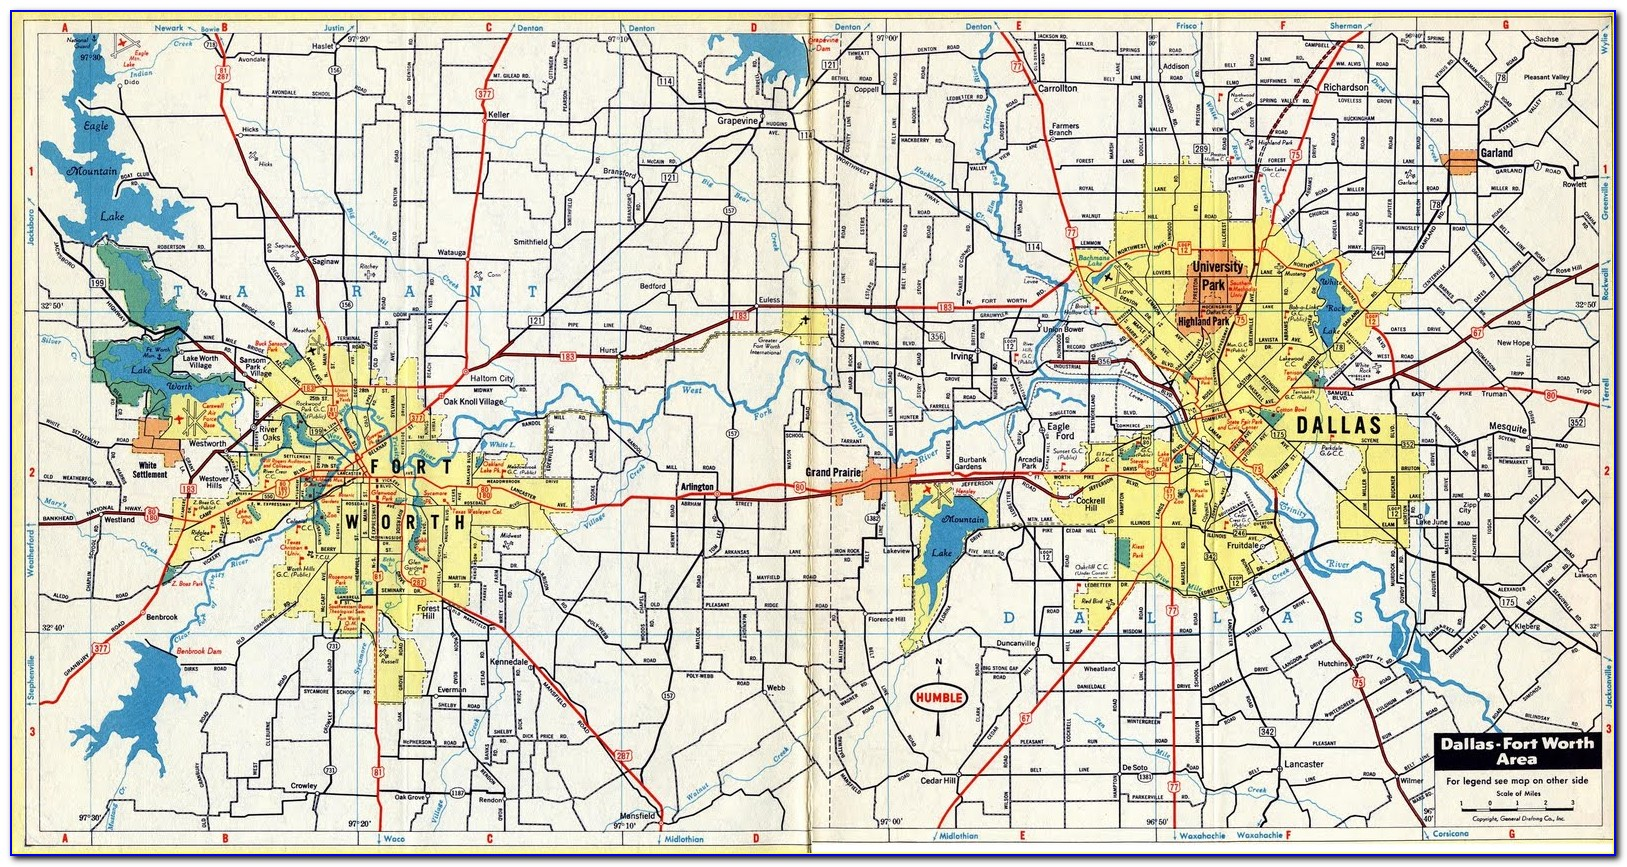 Google Map Of Dfw Metroplex